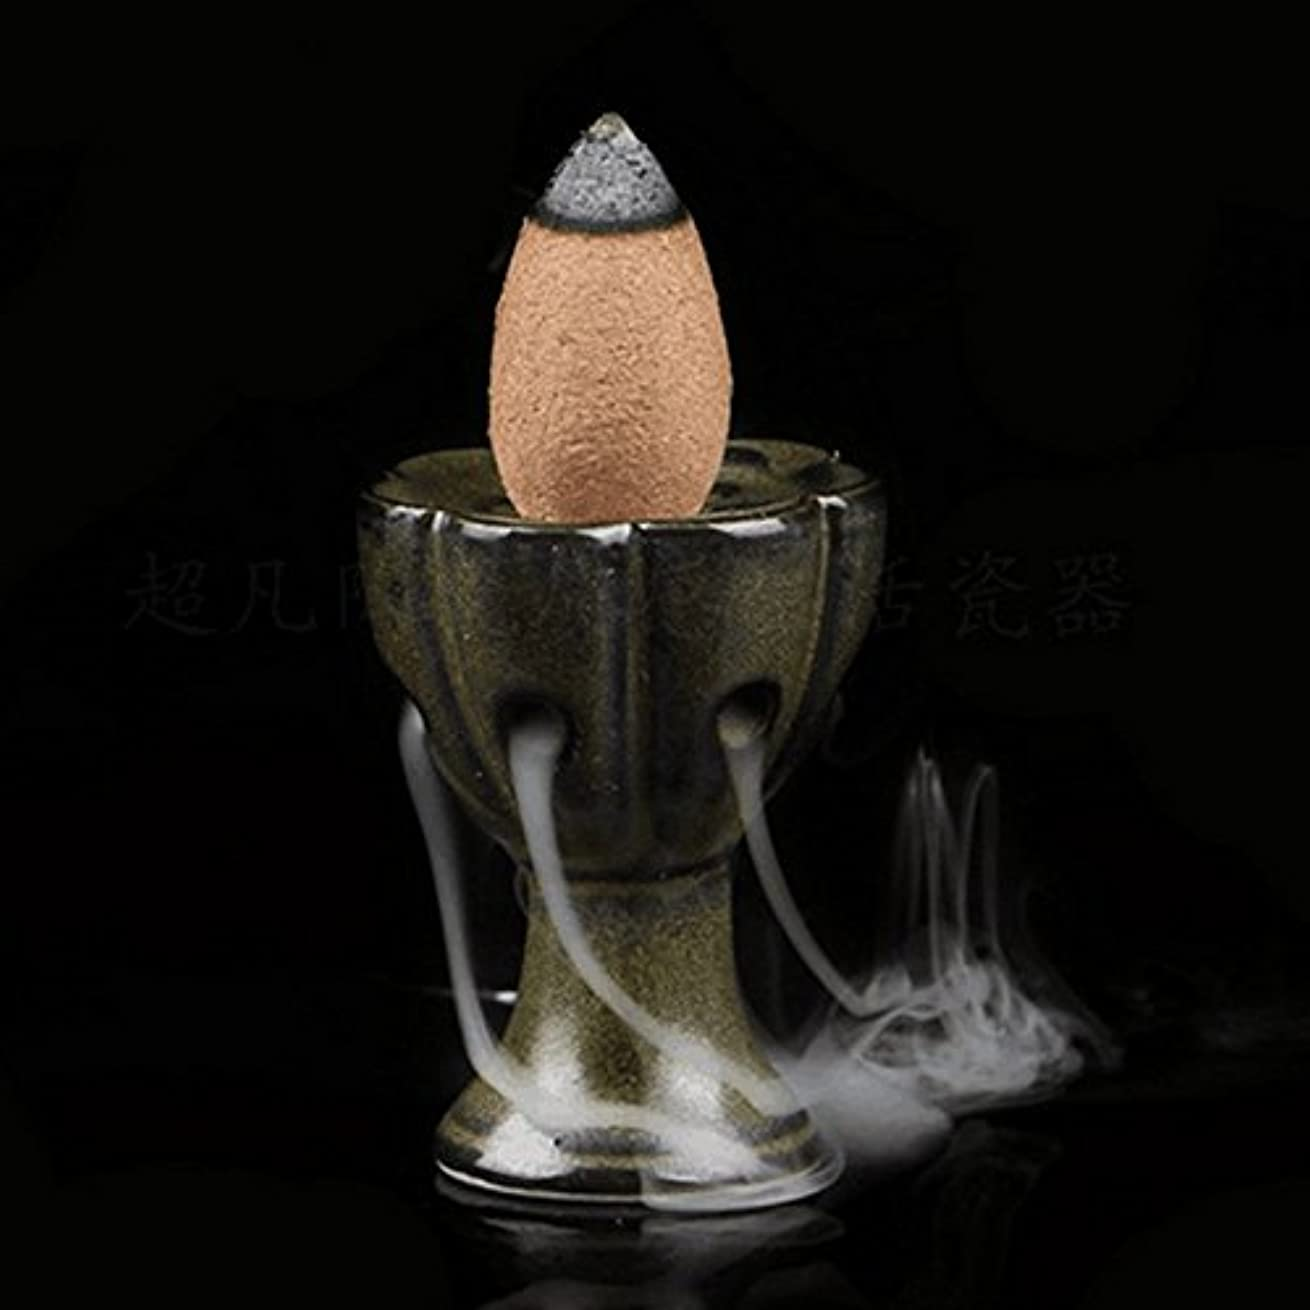 attachmenttou 仏教サンダルウッドコーン ホームデコレーション 逆流香炉クラフト 釉薬香炉ホルダー ミニロータスセラミック